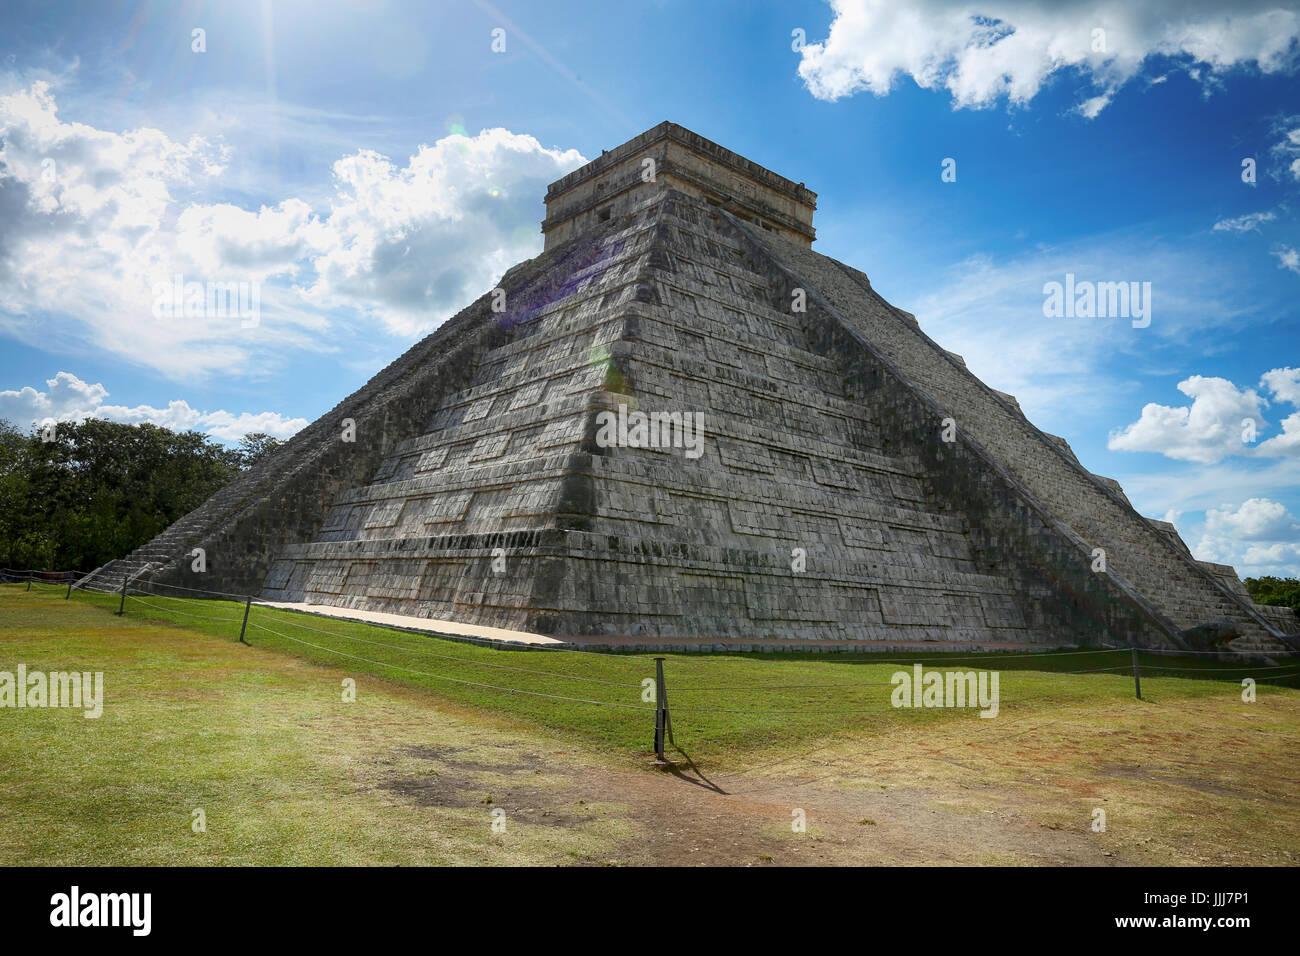 Chichen Itza Pyramid, Wonder of the World, Mexico, yucatan - Stock Image